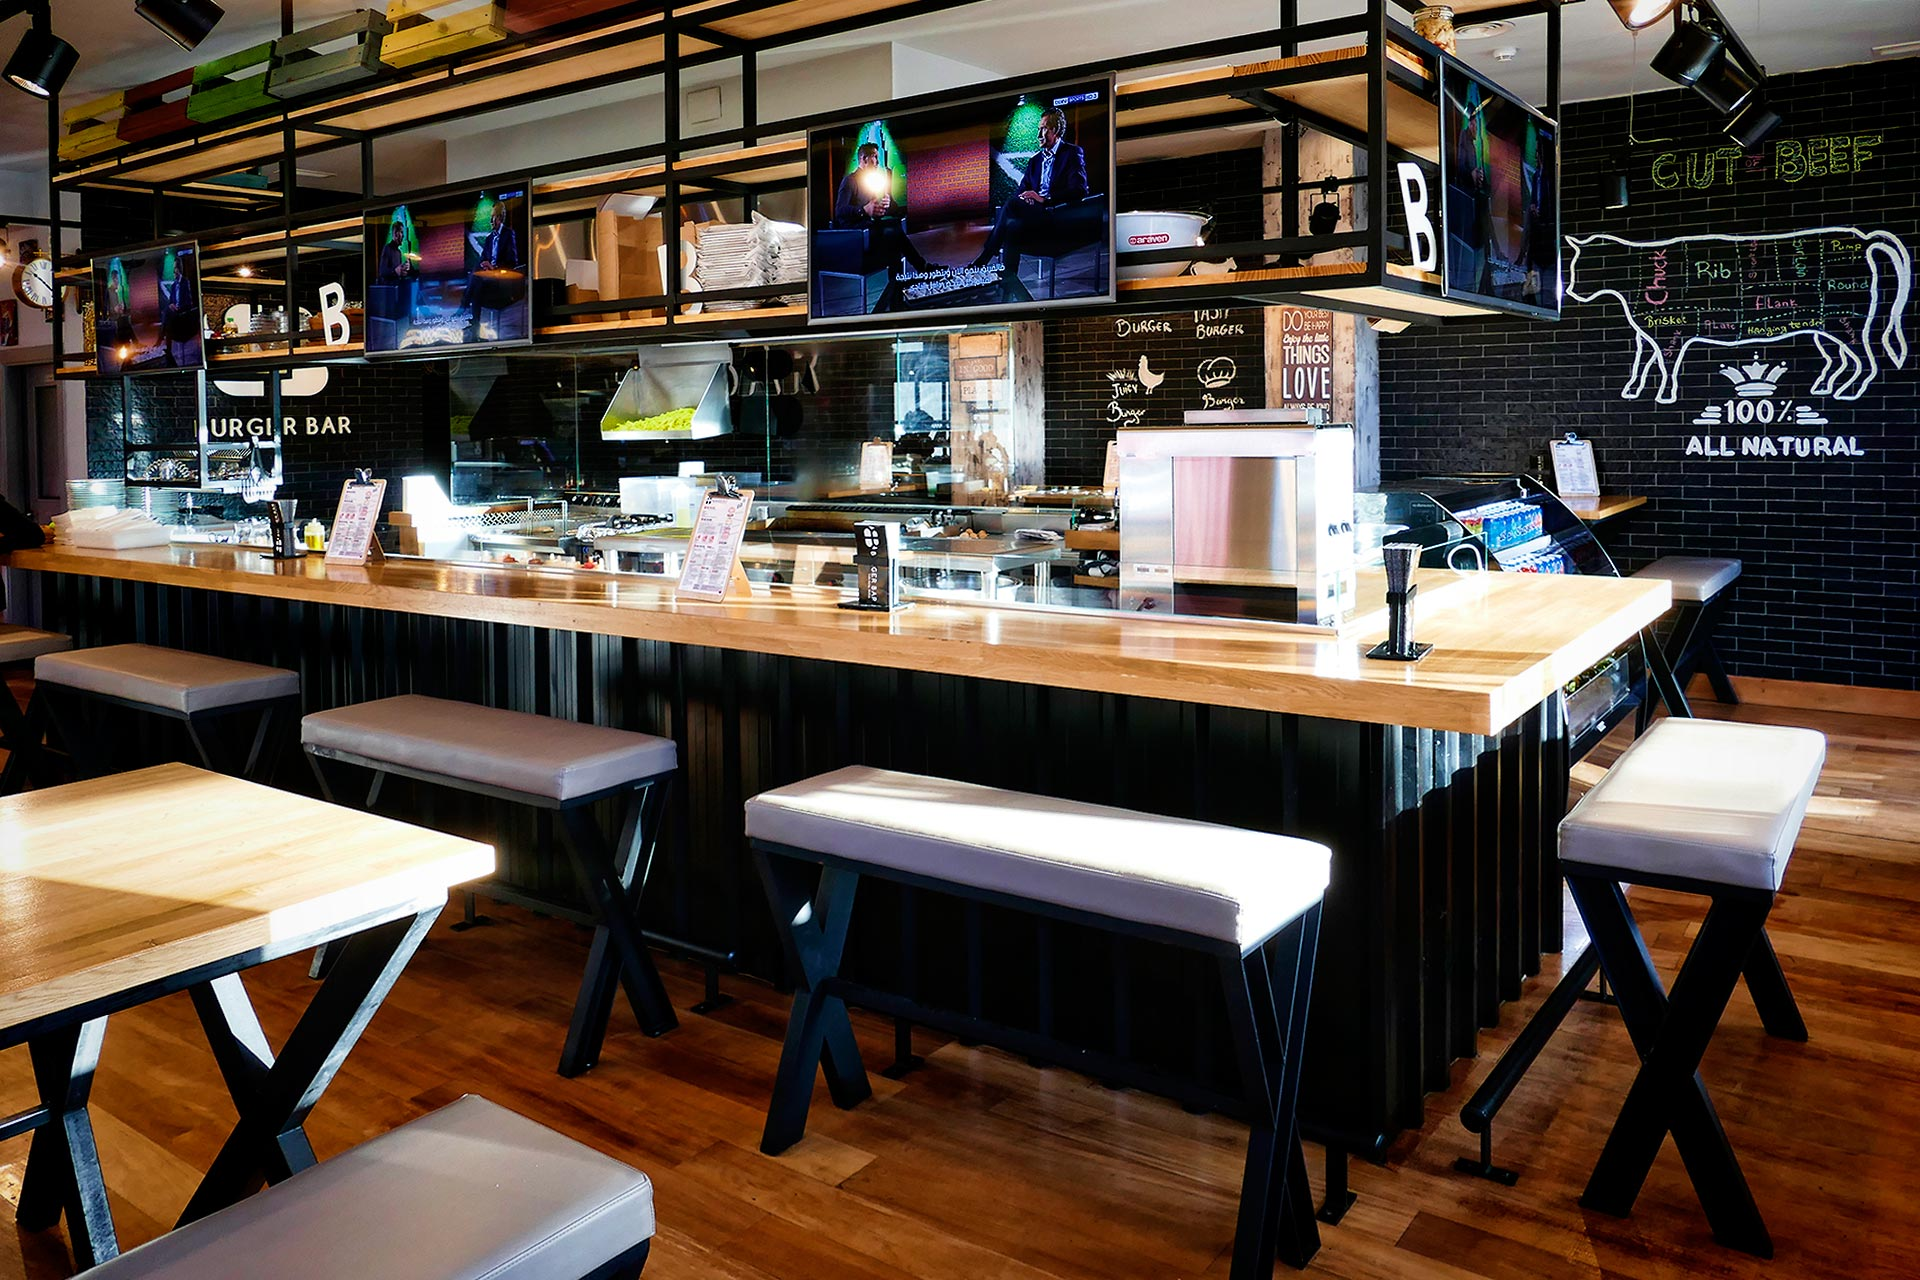 Restaurante Burger, Puerto Banus | Grupo Diezma Marbella